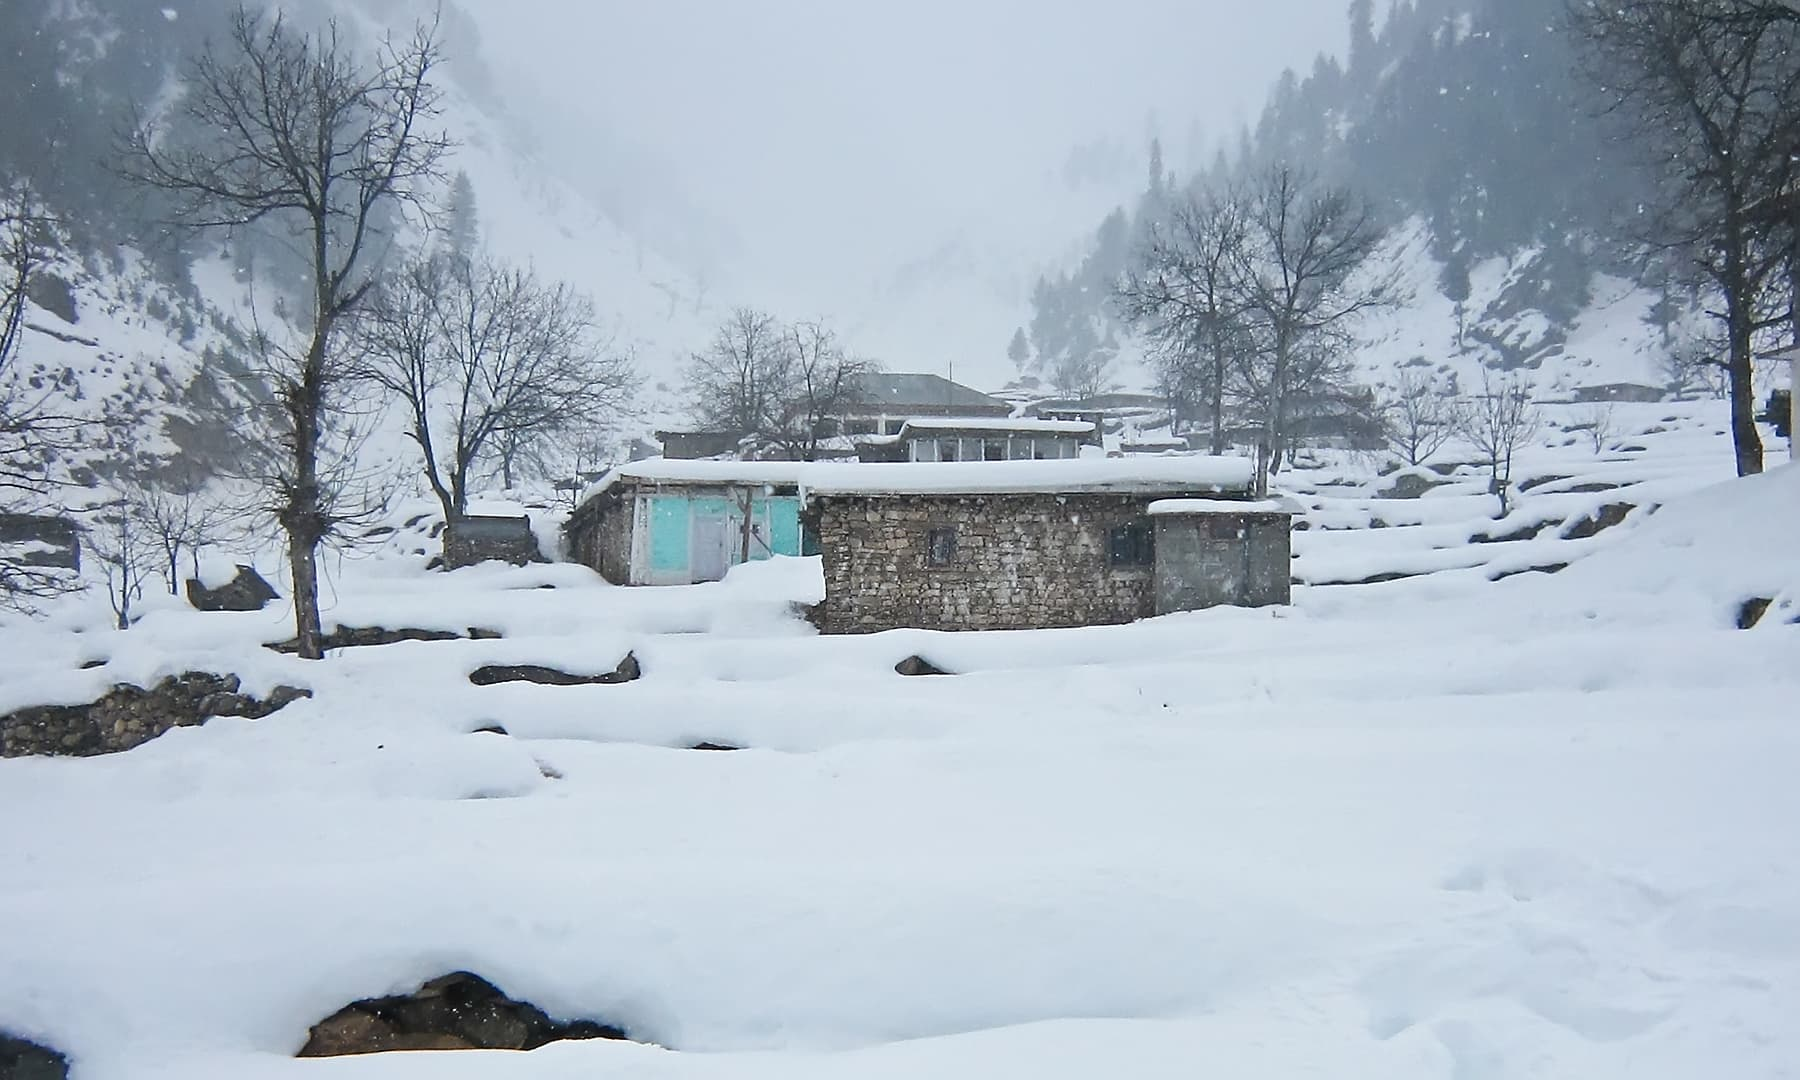 وادی ناران سردیوں میں.— فوٹو سید مہدی بخاری